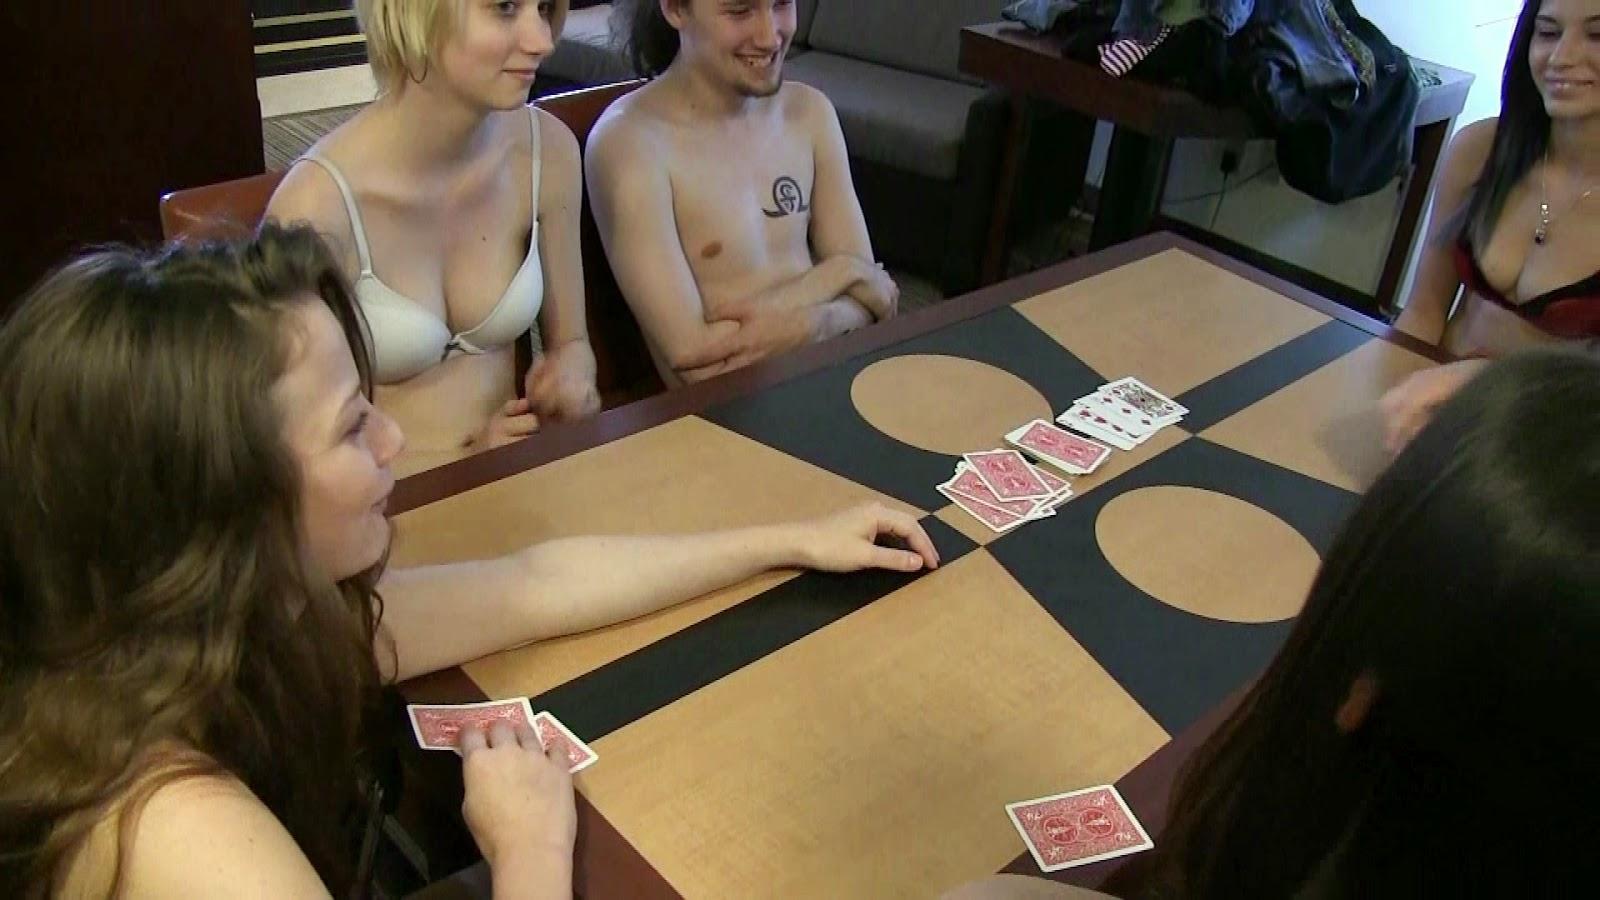 Nude strip poker stories